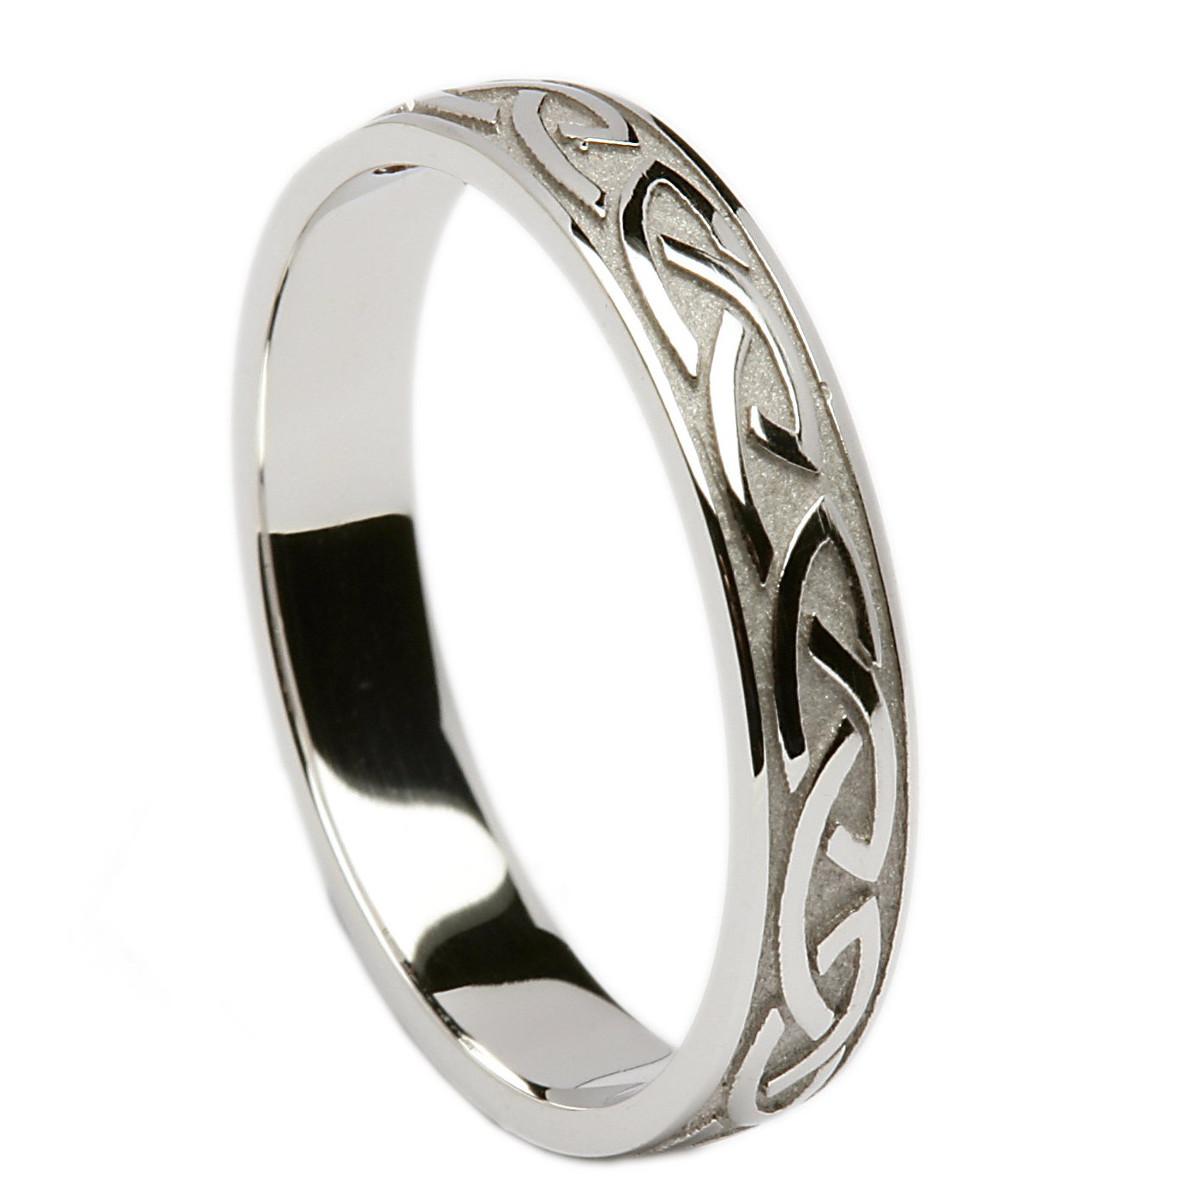 Irish wedding ring celtic knotwork mens wedding band at for Mens irish wedding rings